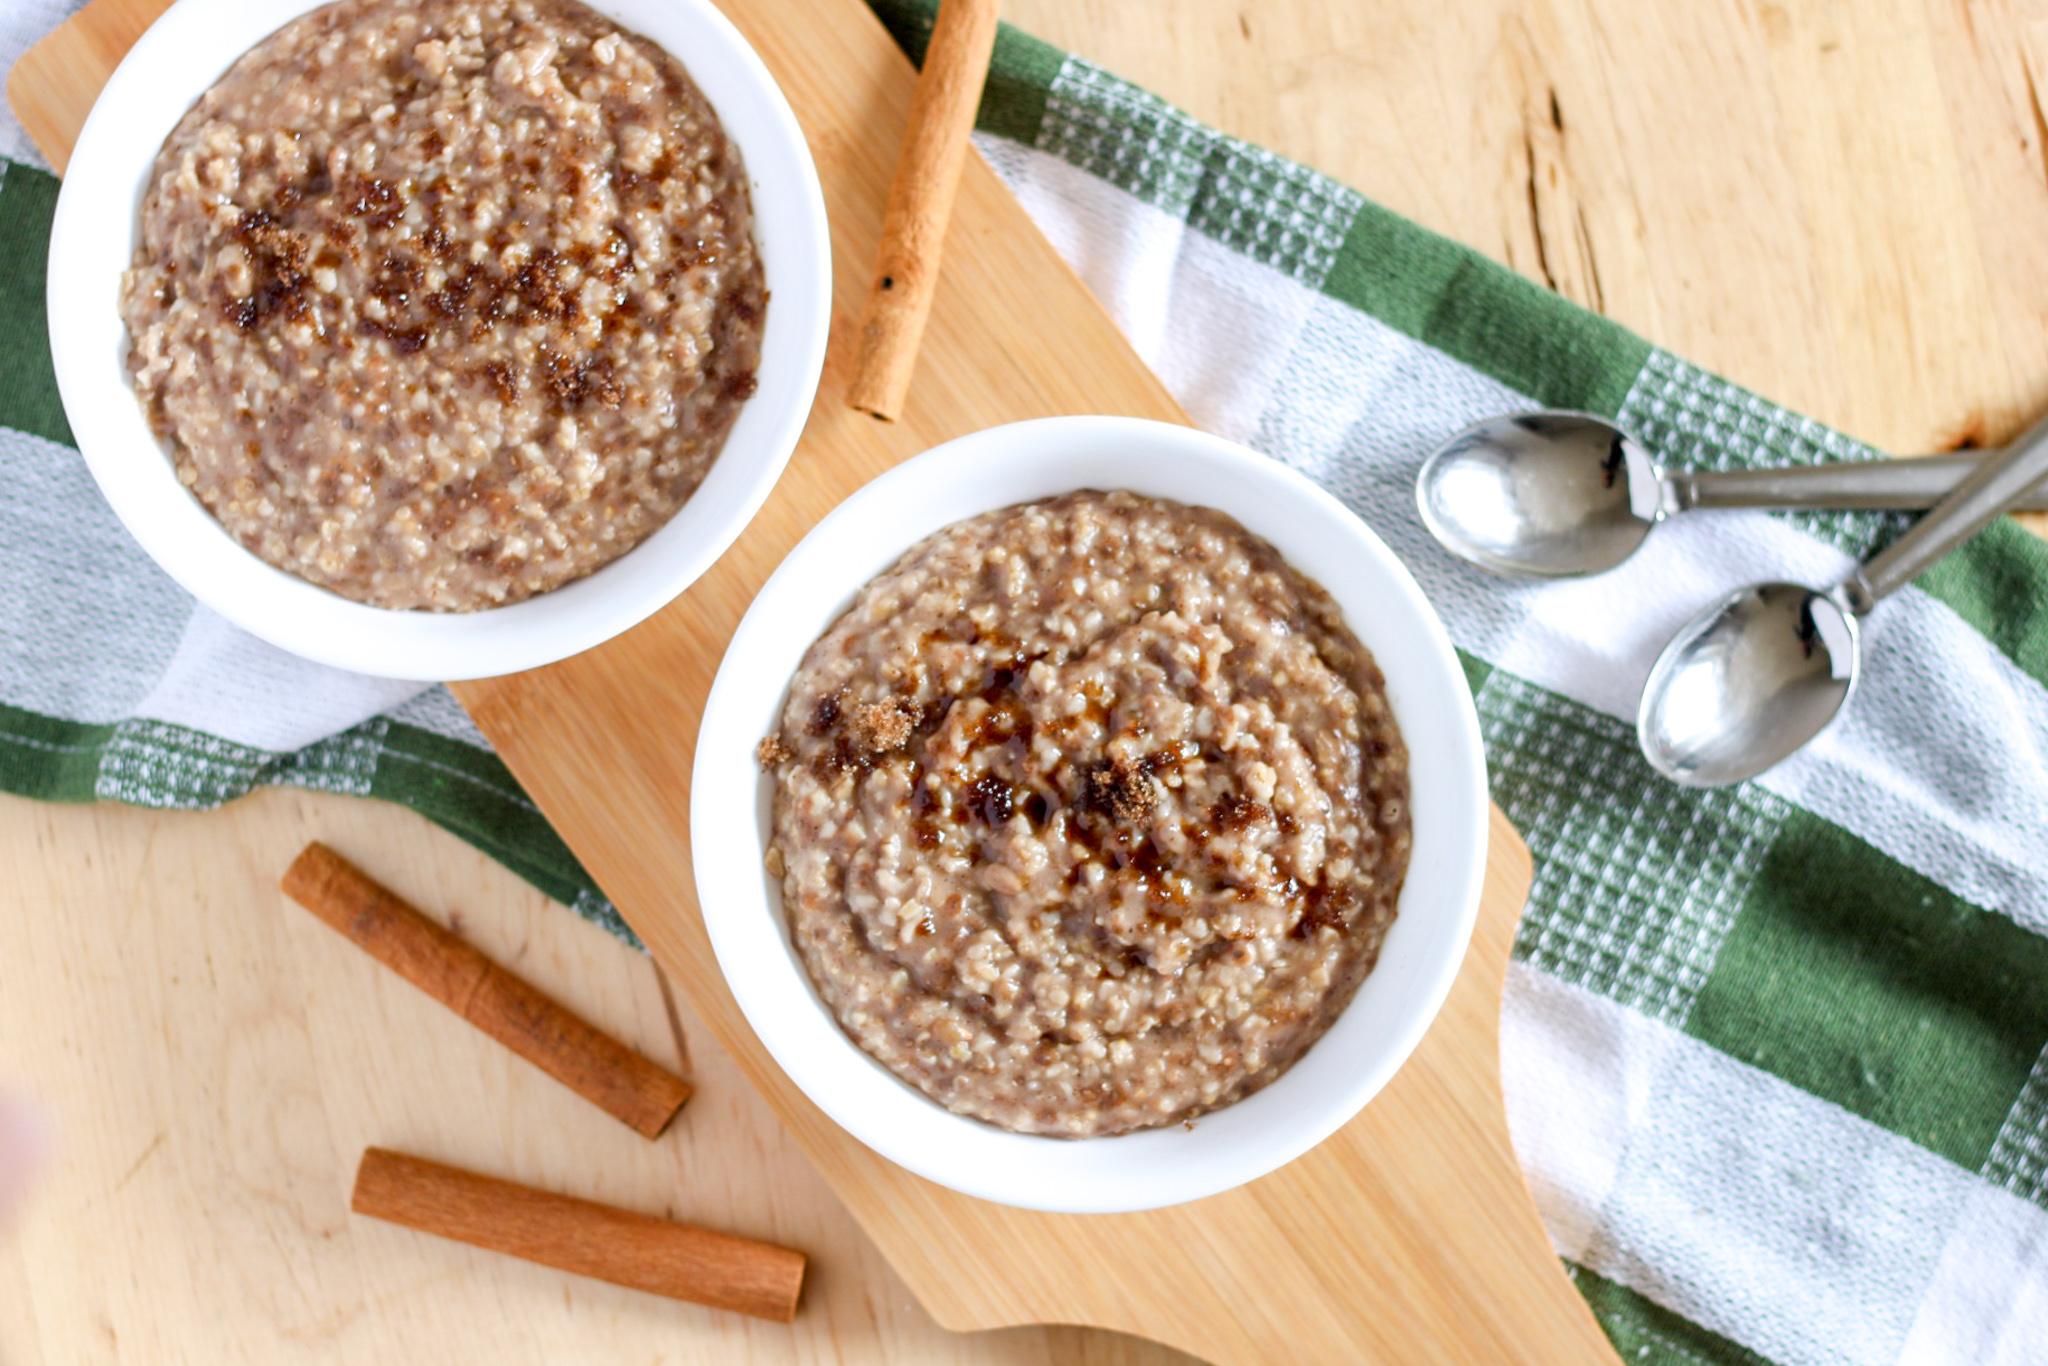 bowls of oatmeal and cinnamon sticks